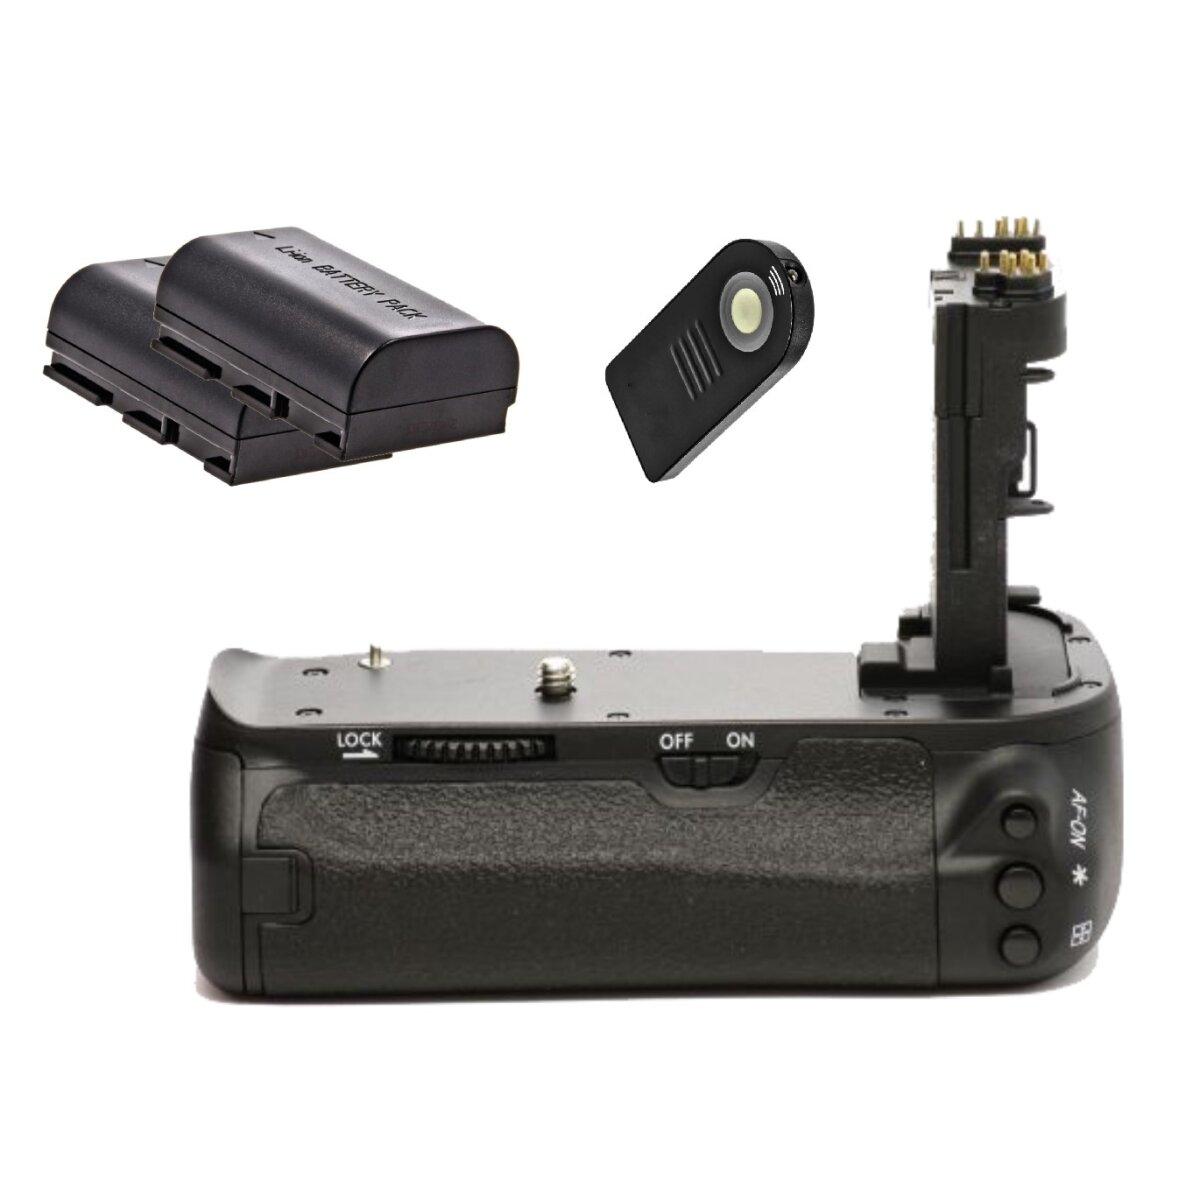 Minadax Profi Batteriegriff kompatibel mit Canon EOS 6D - Ersatz für BG-E13 - für 2x LP-E6 und 6x AA Batterien + 2 LP-E6 Nachbau-Akkus + 1x Infrarot Fernbedienung!